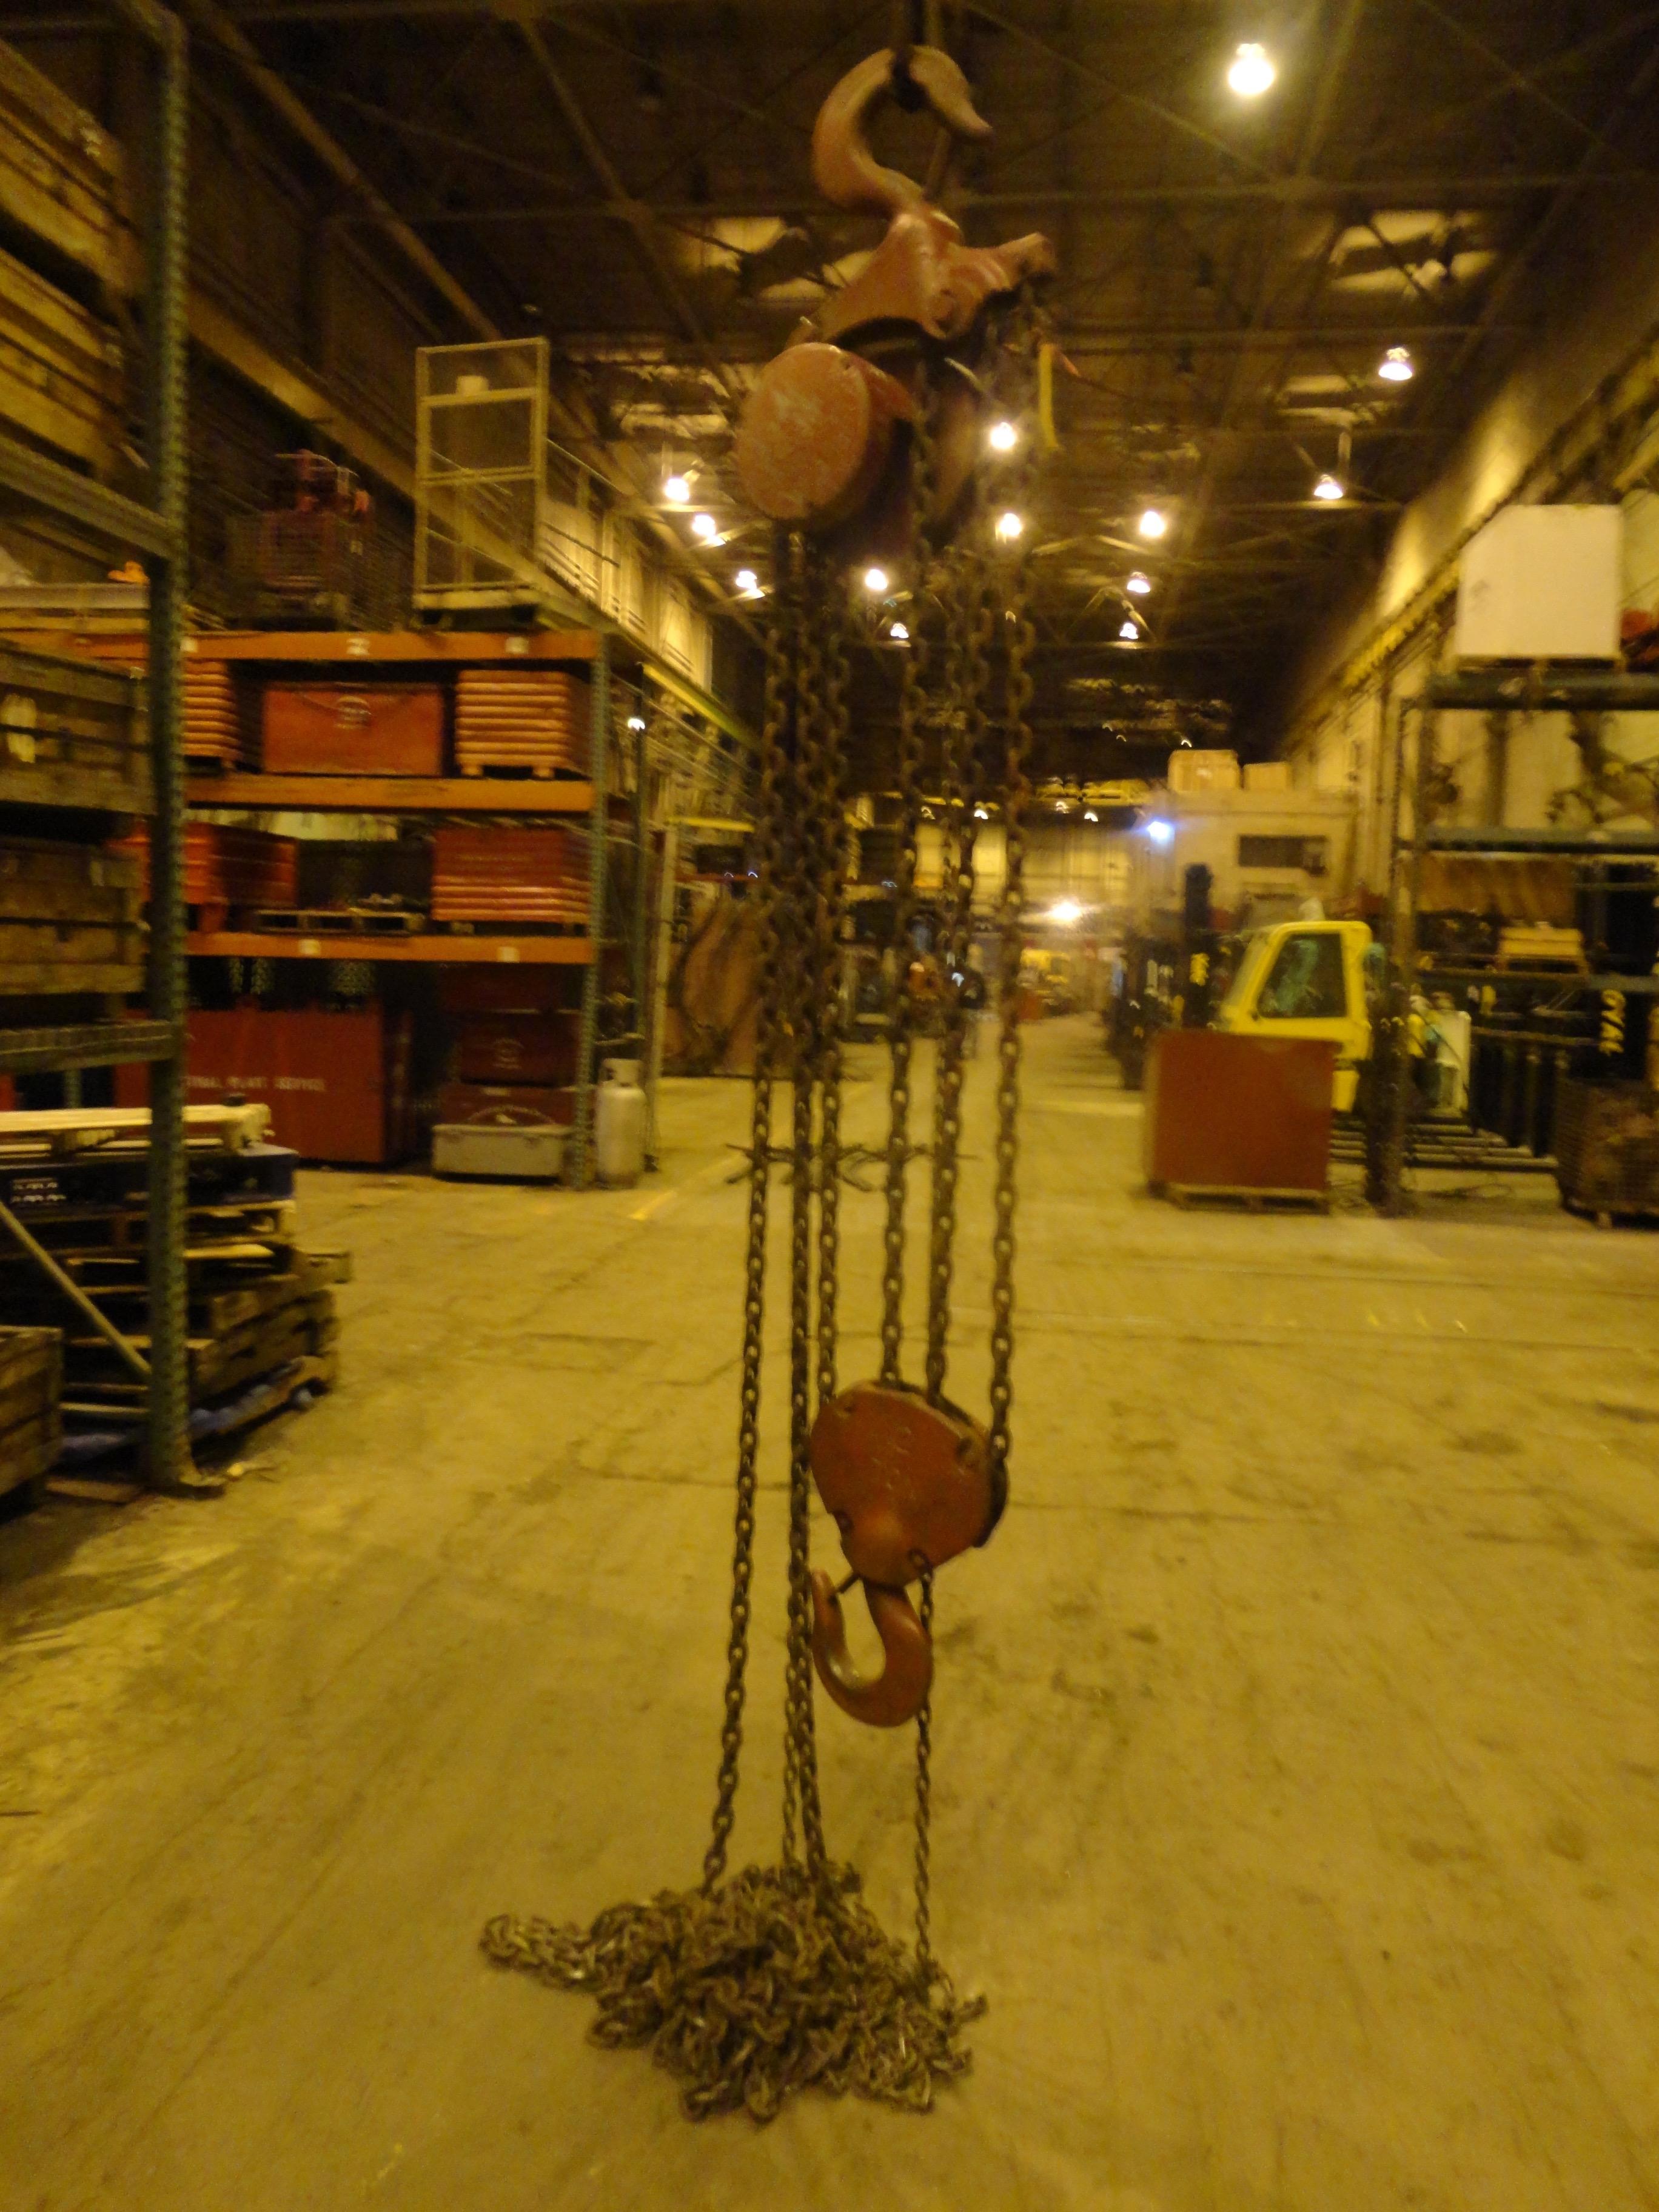 Lot 15 - 12 Ton Yale Chain Hoist (#15)